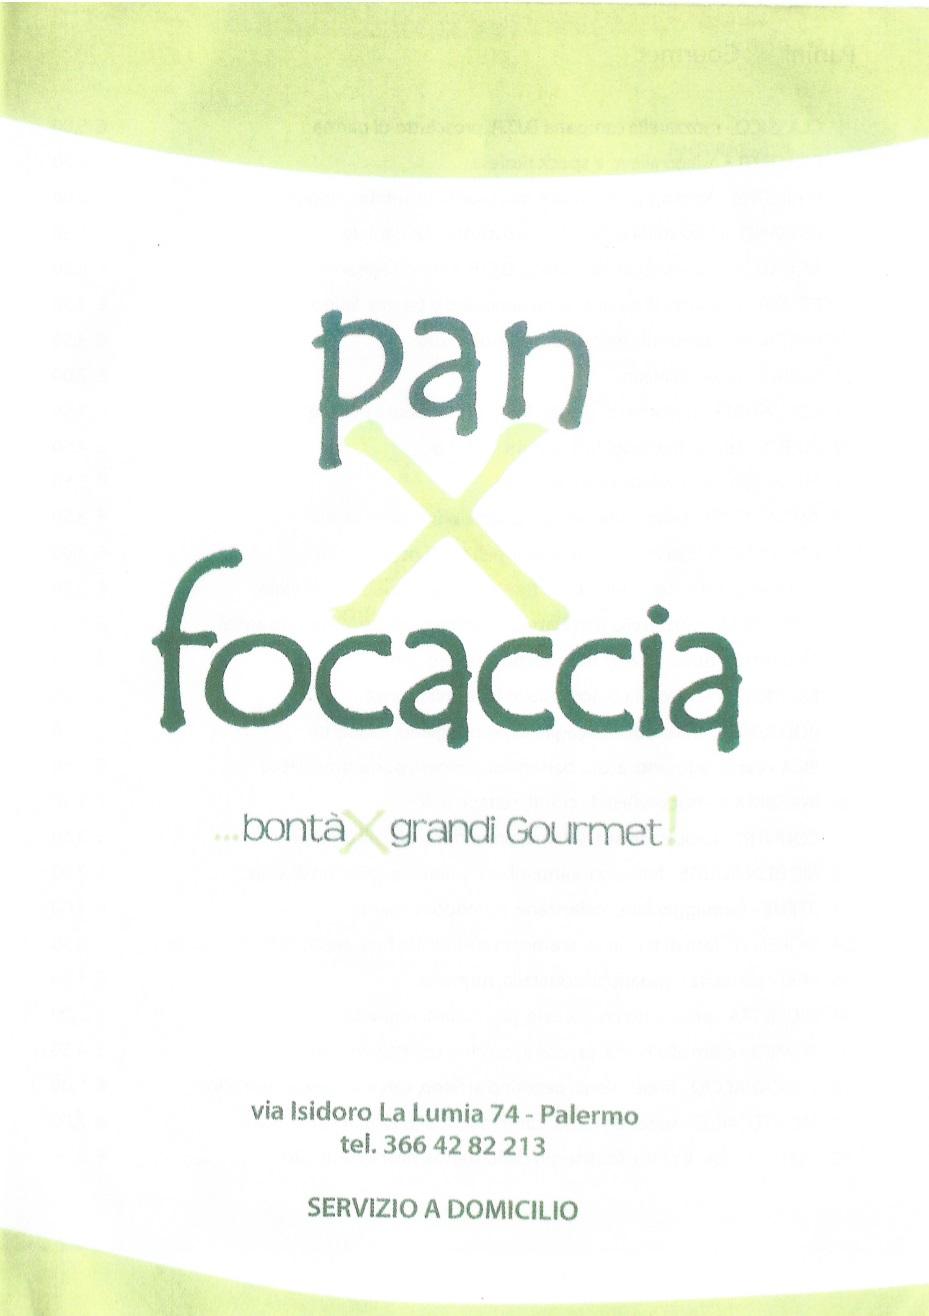 PAN X FOCACCIA Palermo menù 1 pagina